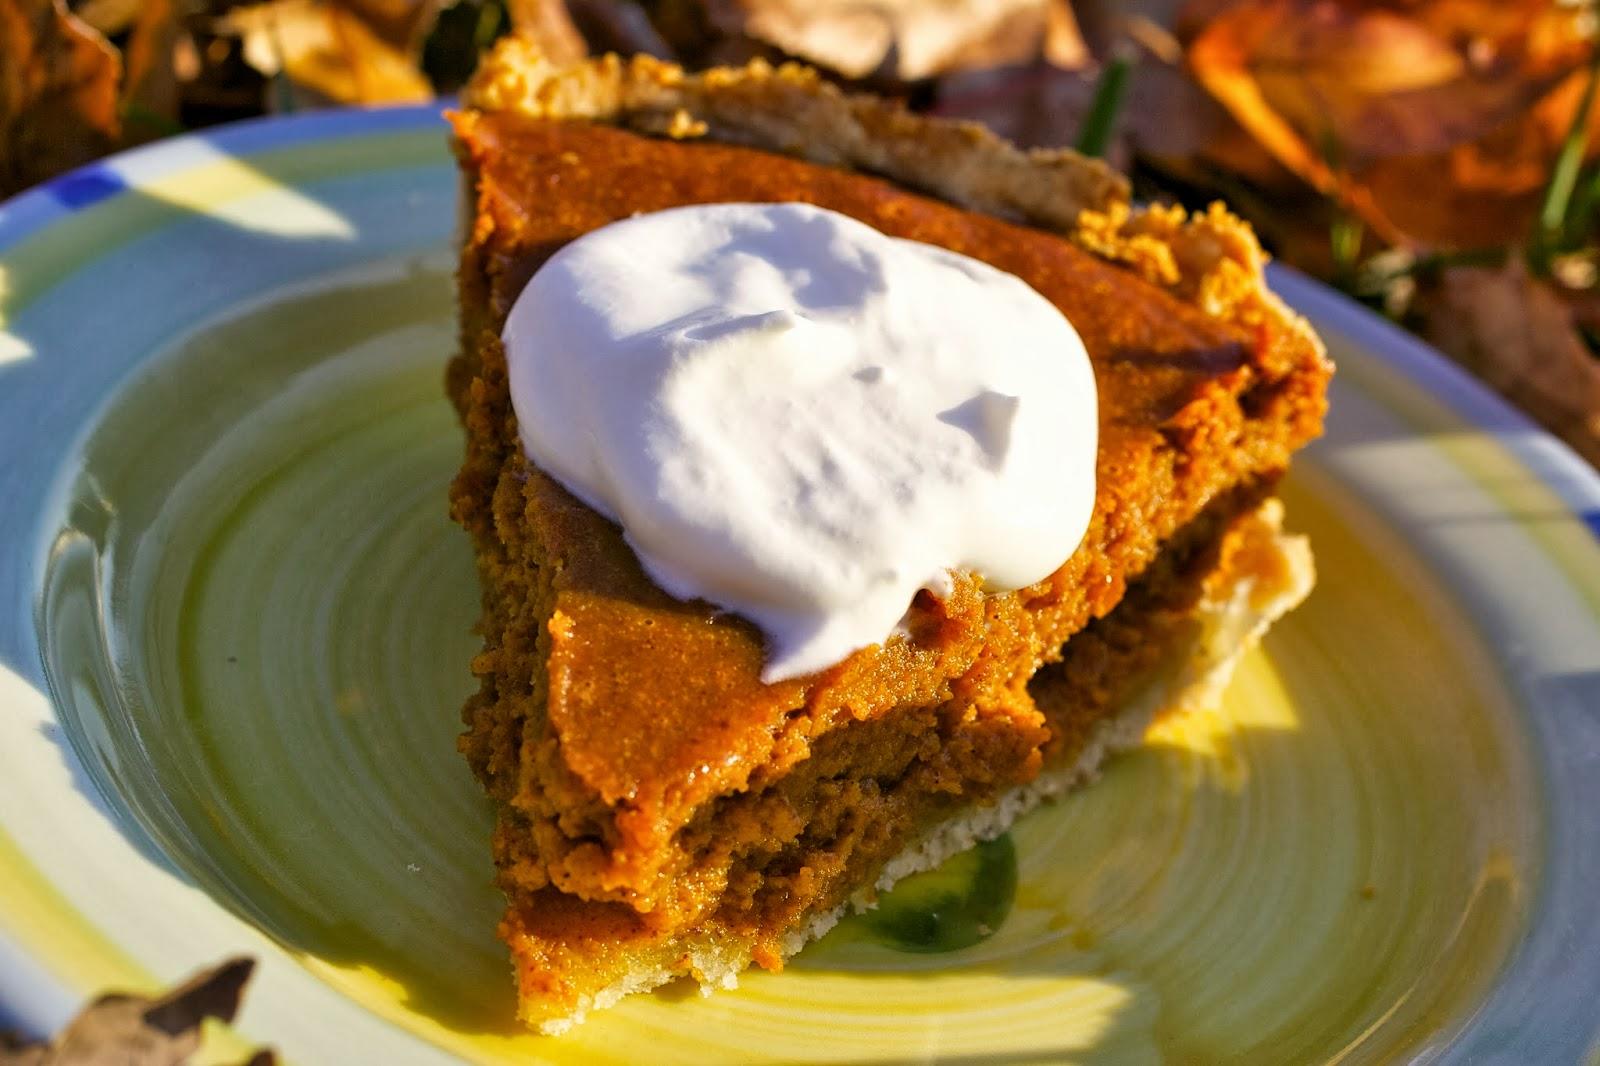 Mmm - pumpkin pie with homemade whipped cream.